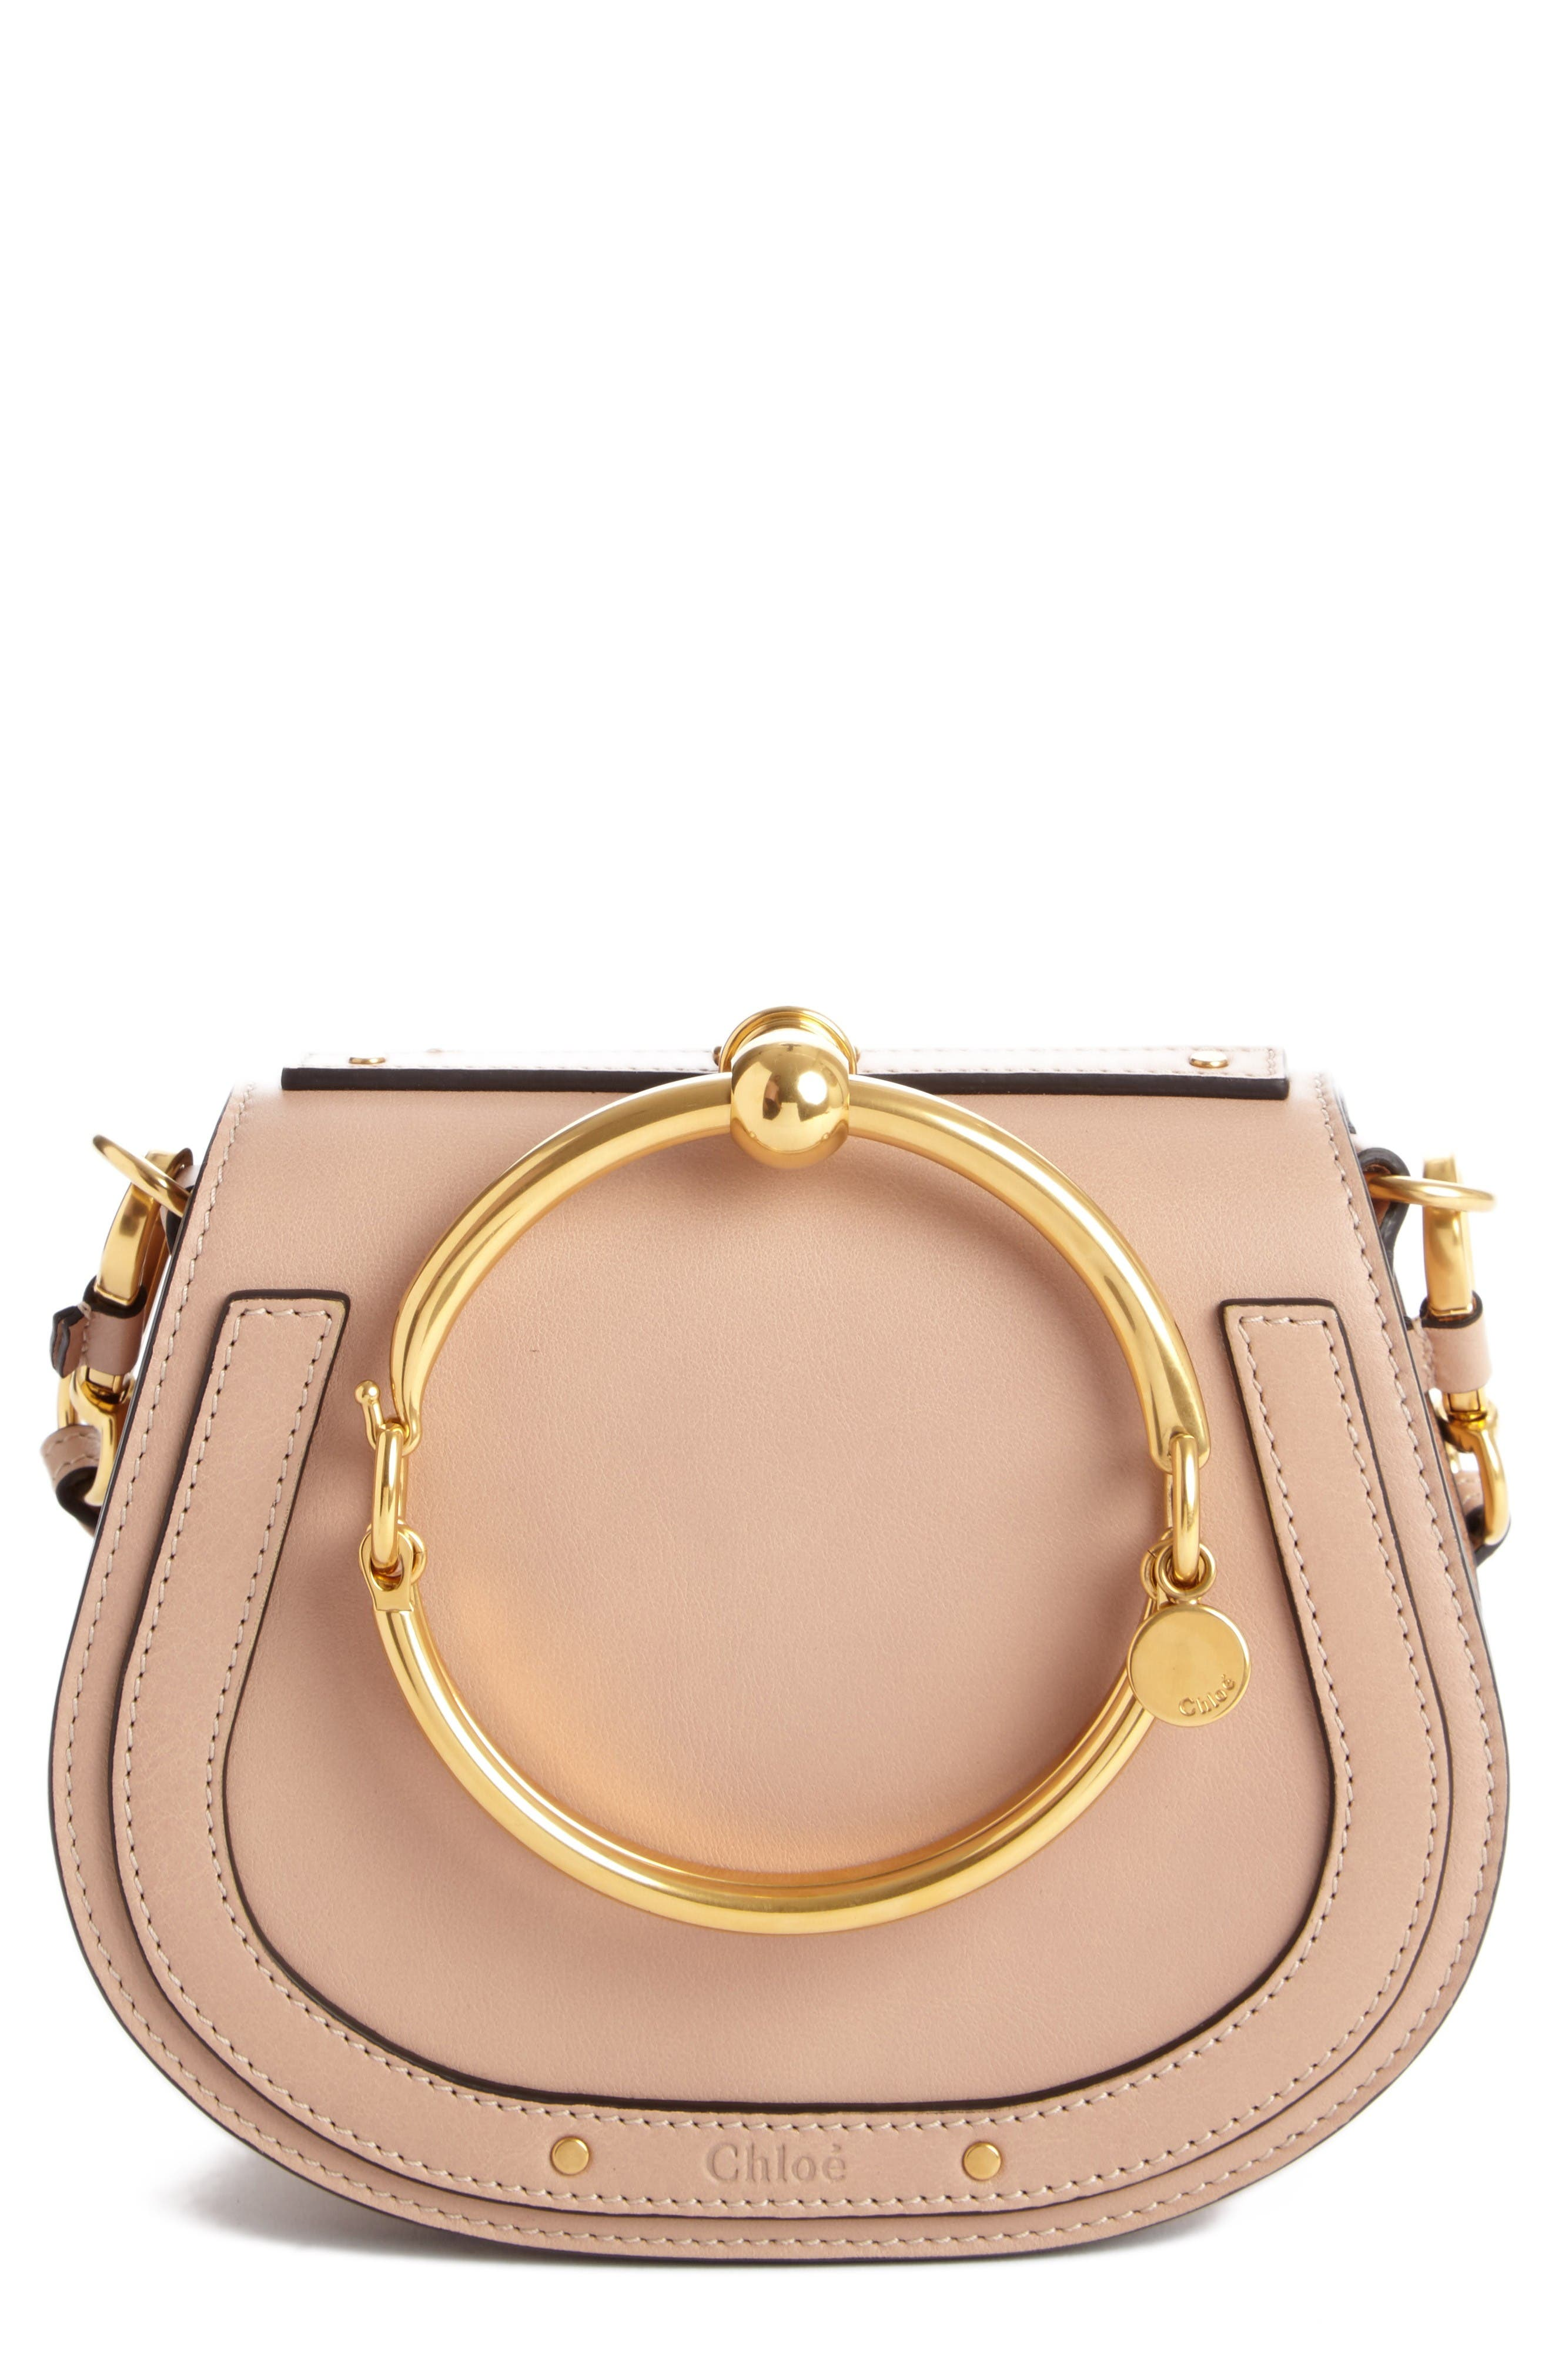 Main Image - Chloé Small Nile Bracelet Leather Crossbody Bag